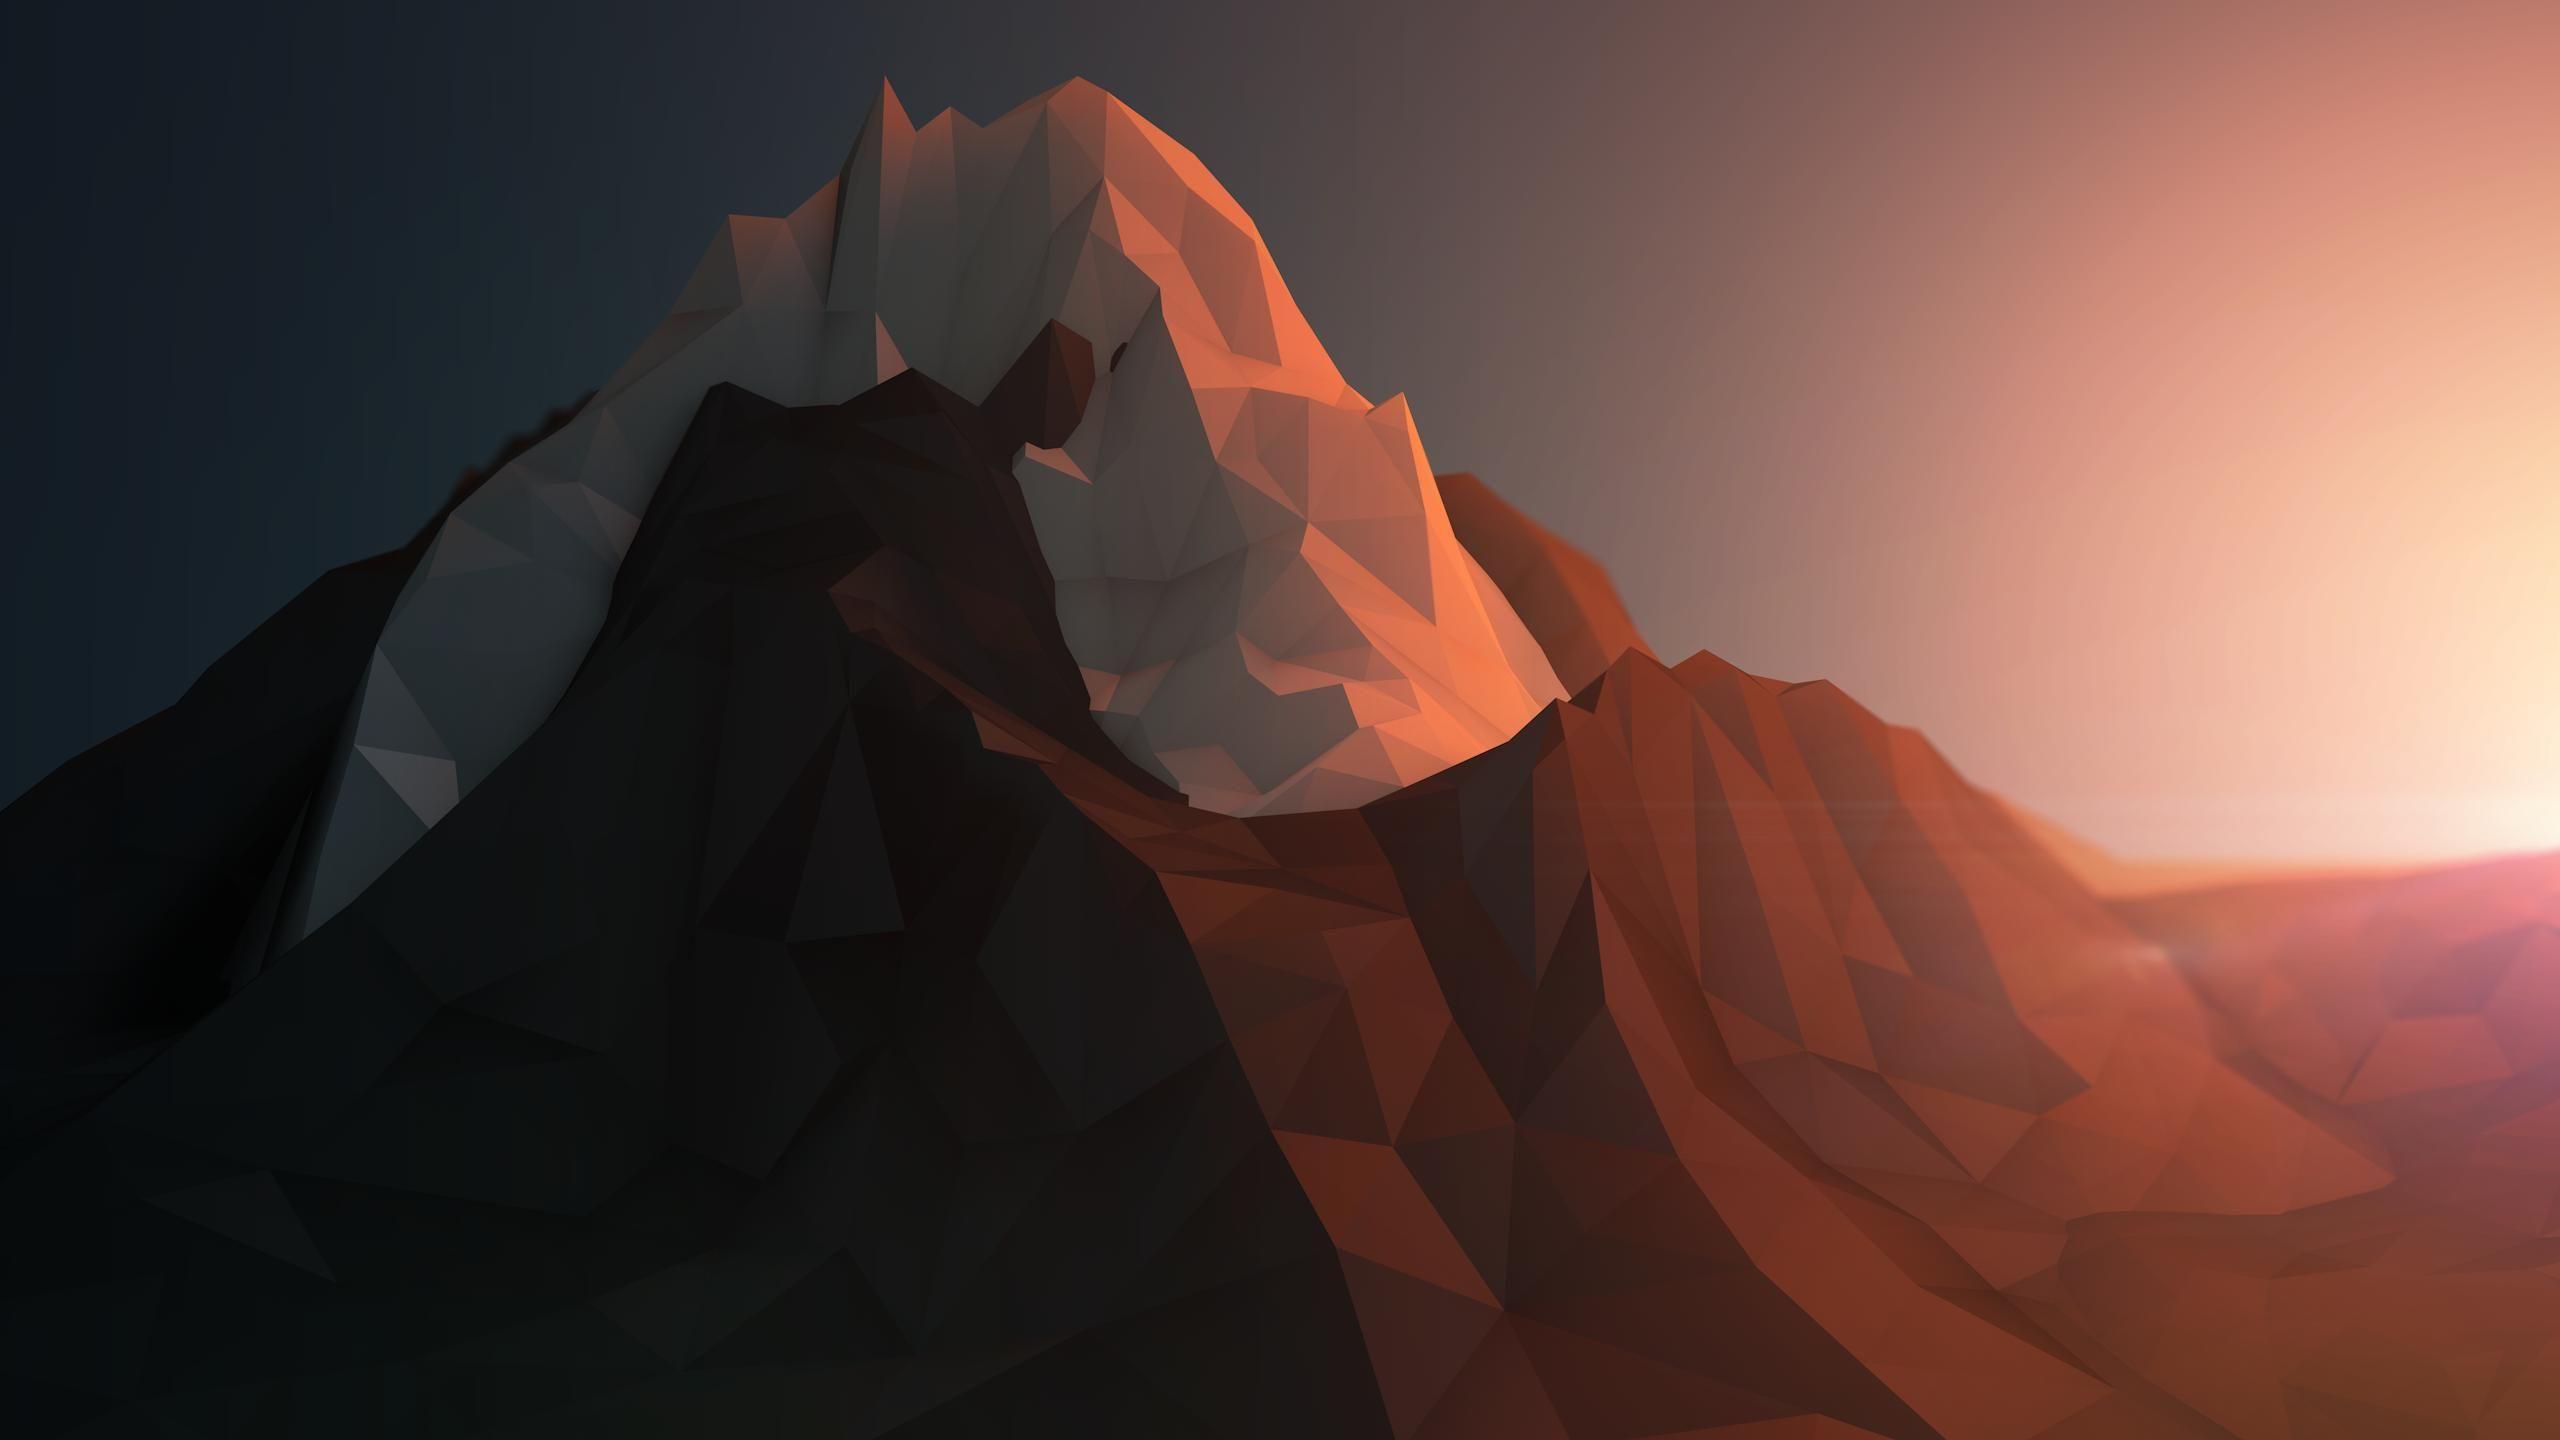 Low Poly Art Wallpapers Polygon Art Cool Wallpaper Mountain